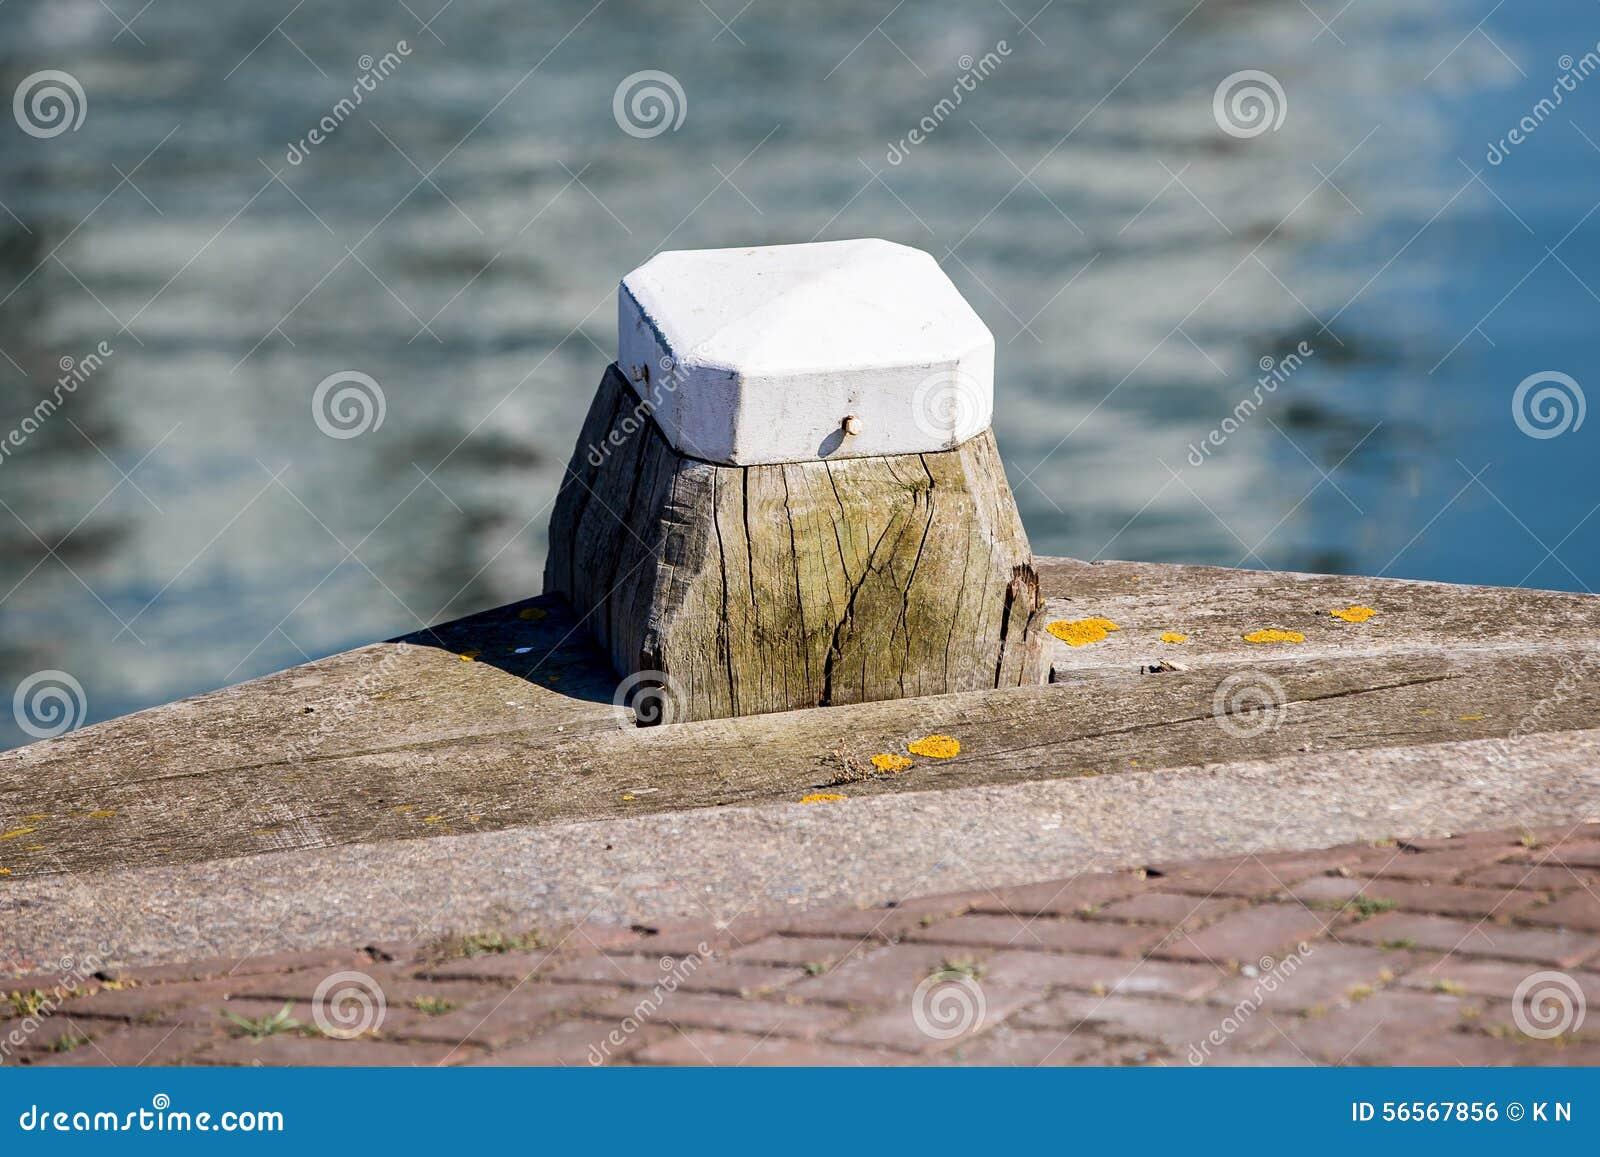 Download Ξύλινος με τον άσπρο στυλίσκο στο λιμάνι Στοκ Εικόνες - εικόνα από χάγη, δάσος: 56567856